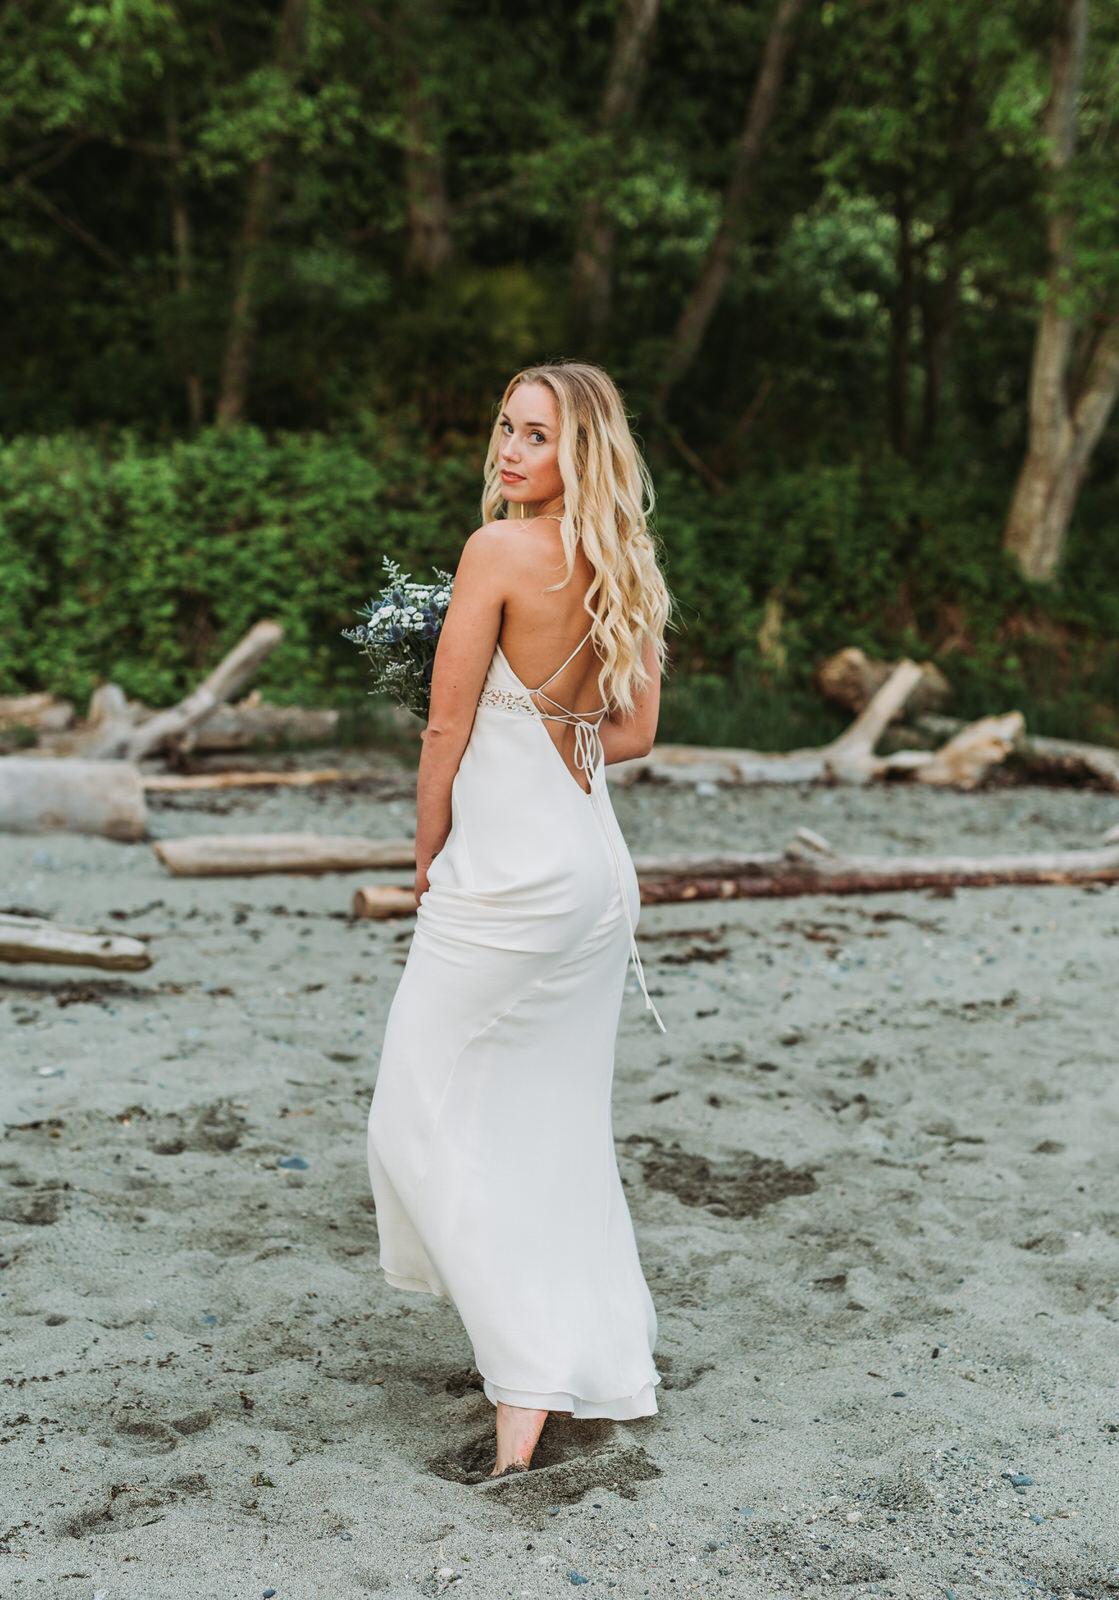 Jennifer Picard Photography - Vancouver Wedding Photographer - Sunshine Coast Wedding Photographer - Bridal InspirationIMG_9506.jpg